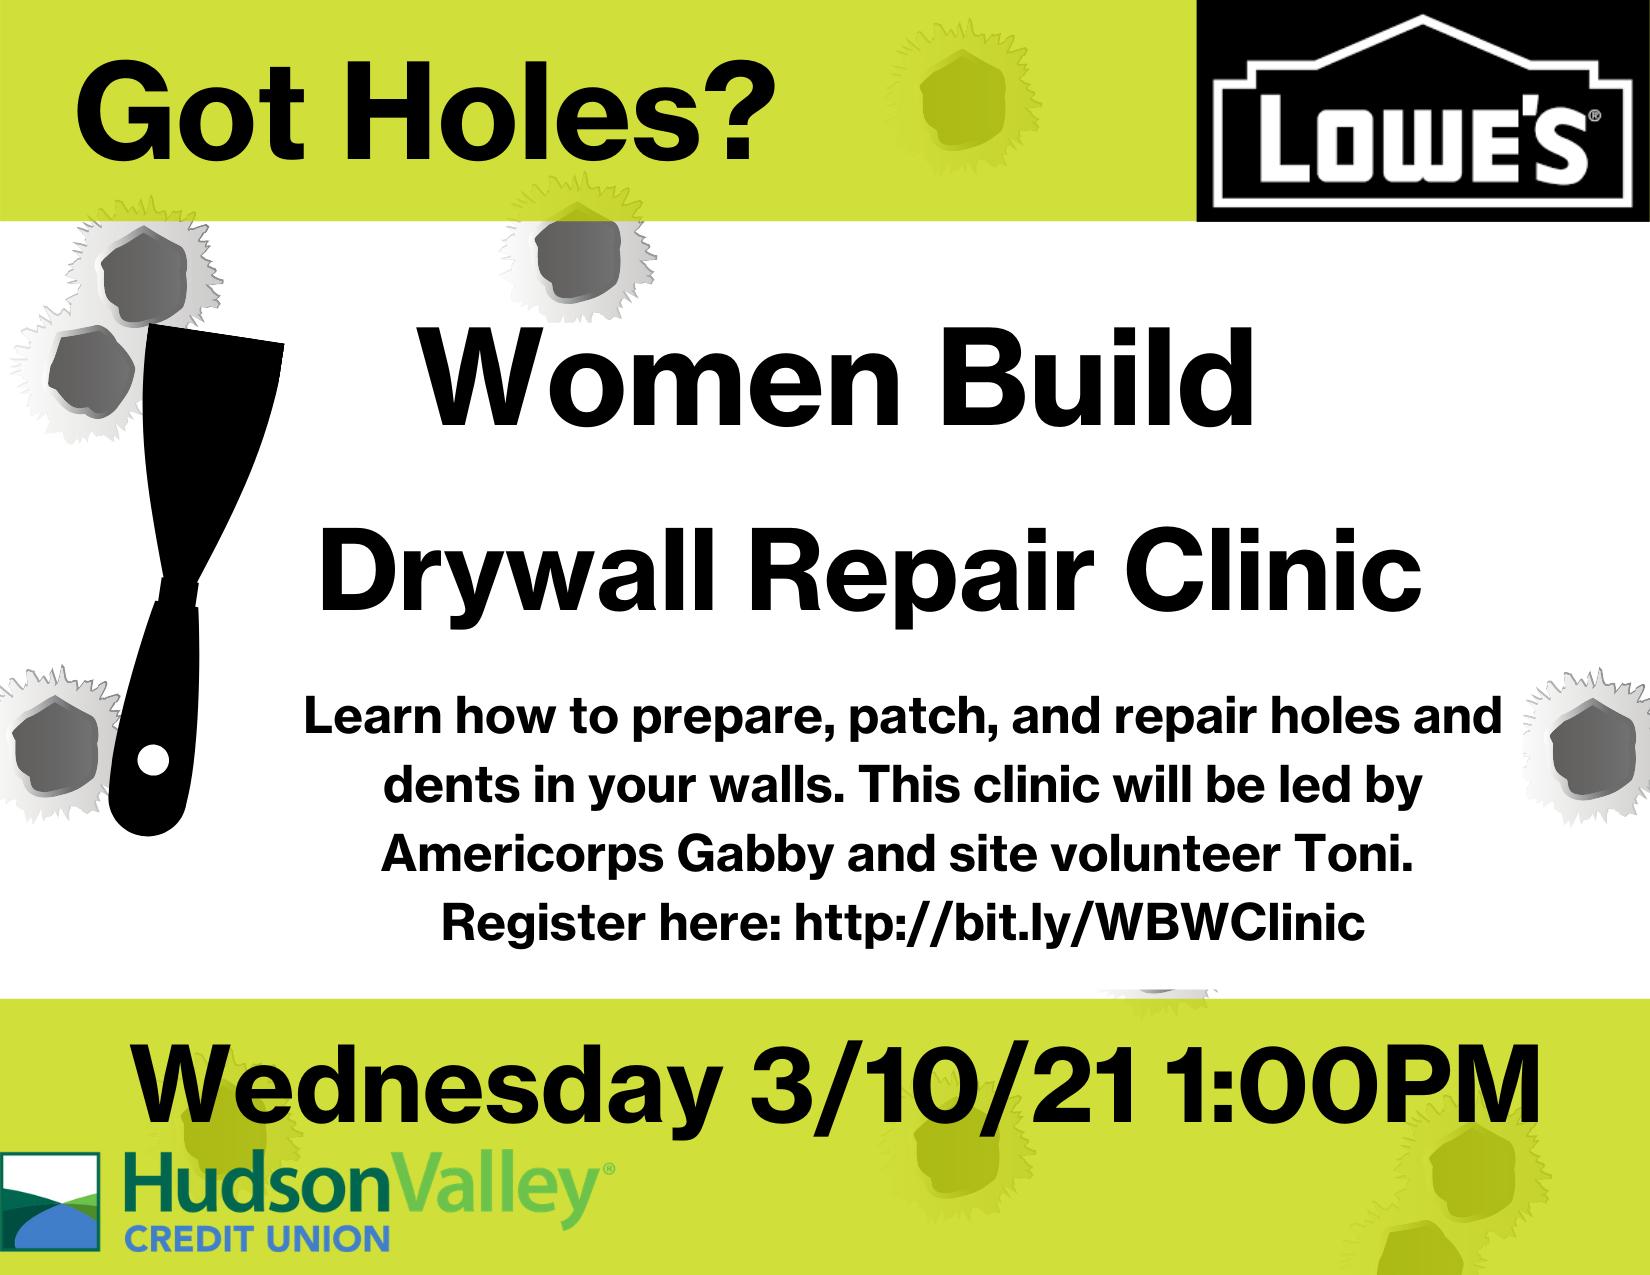 Women Build Drywall Repair Clinic